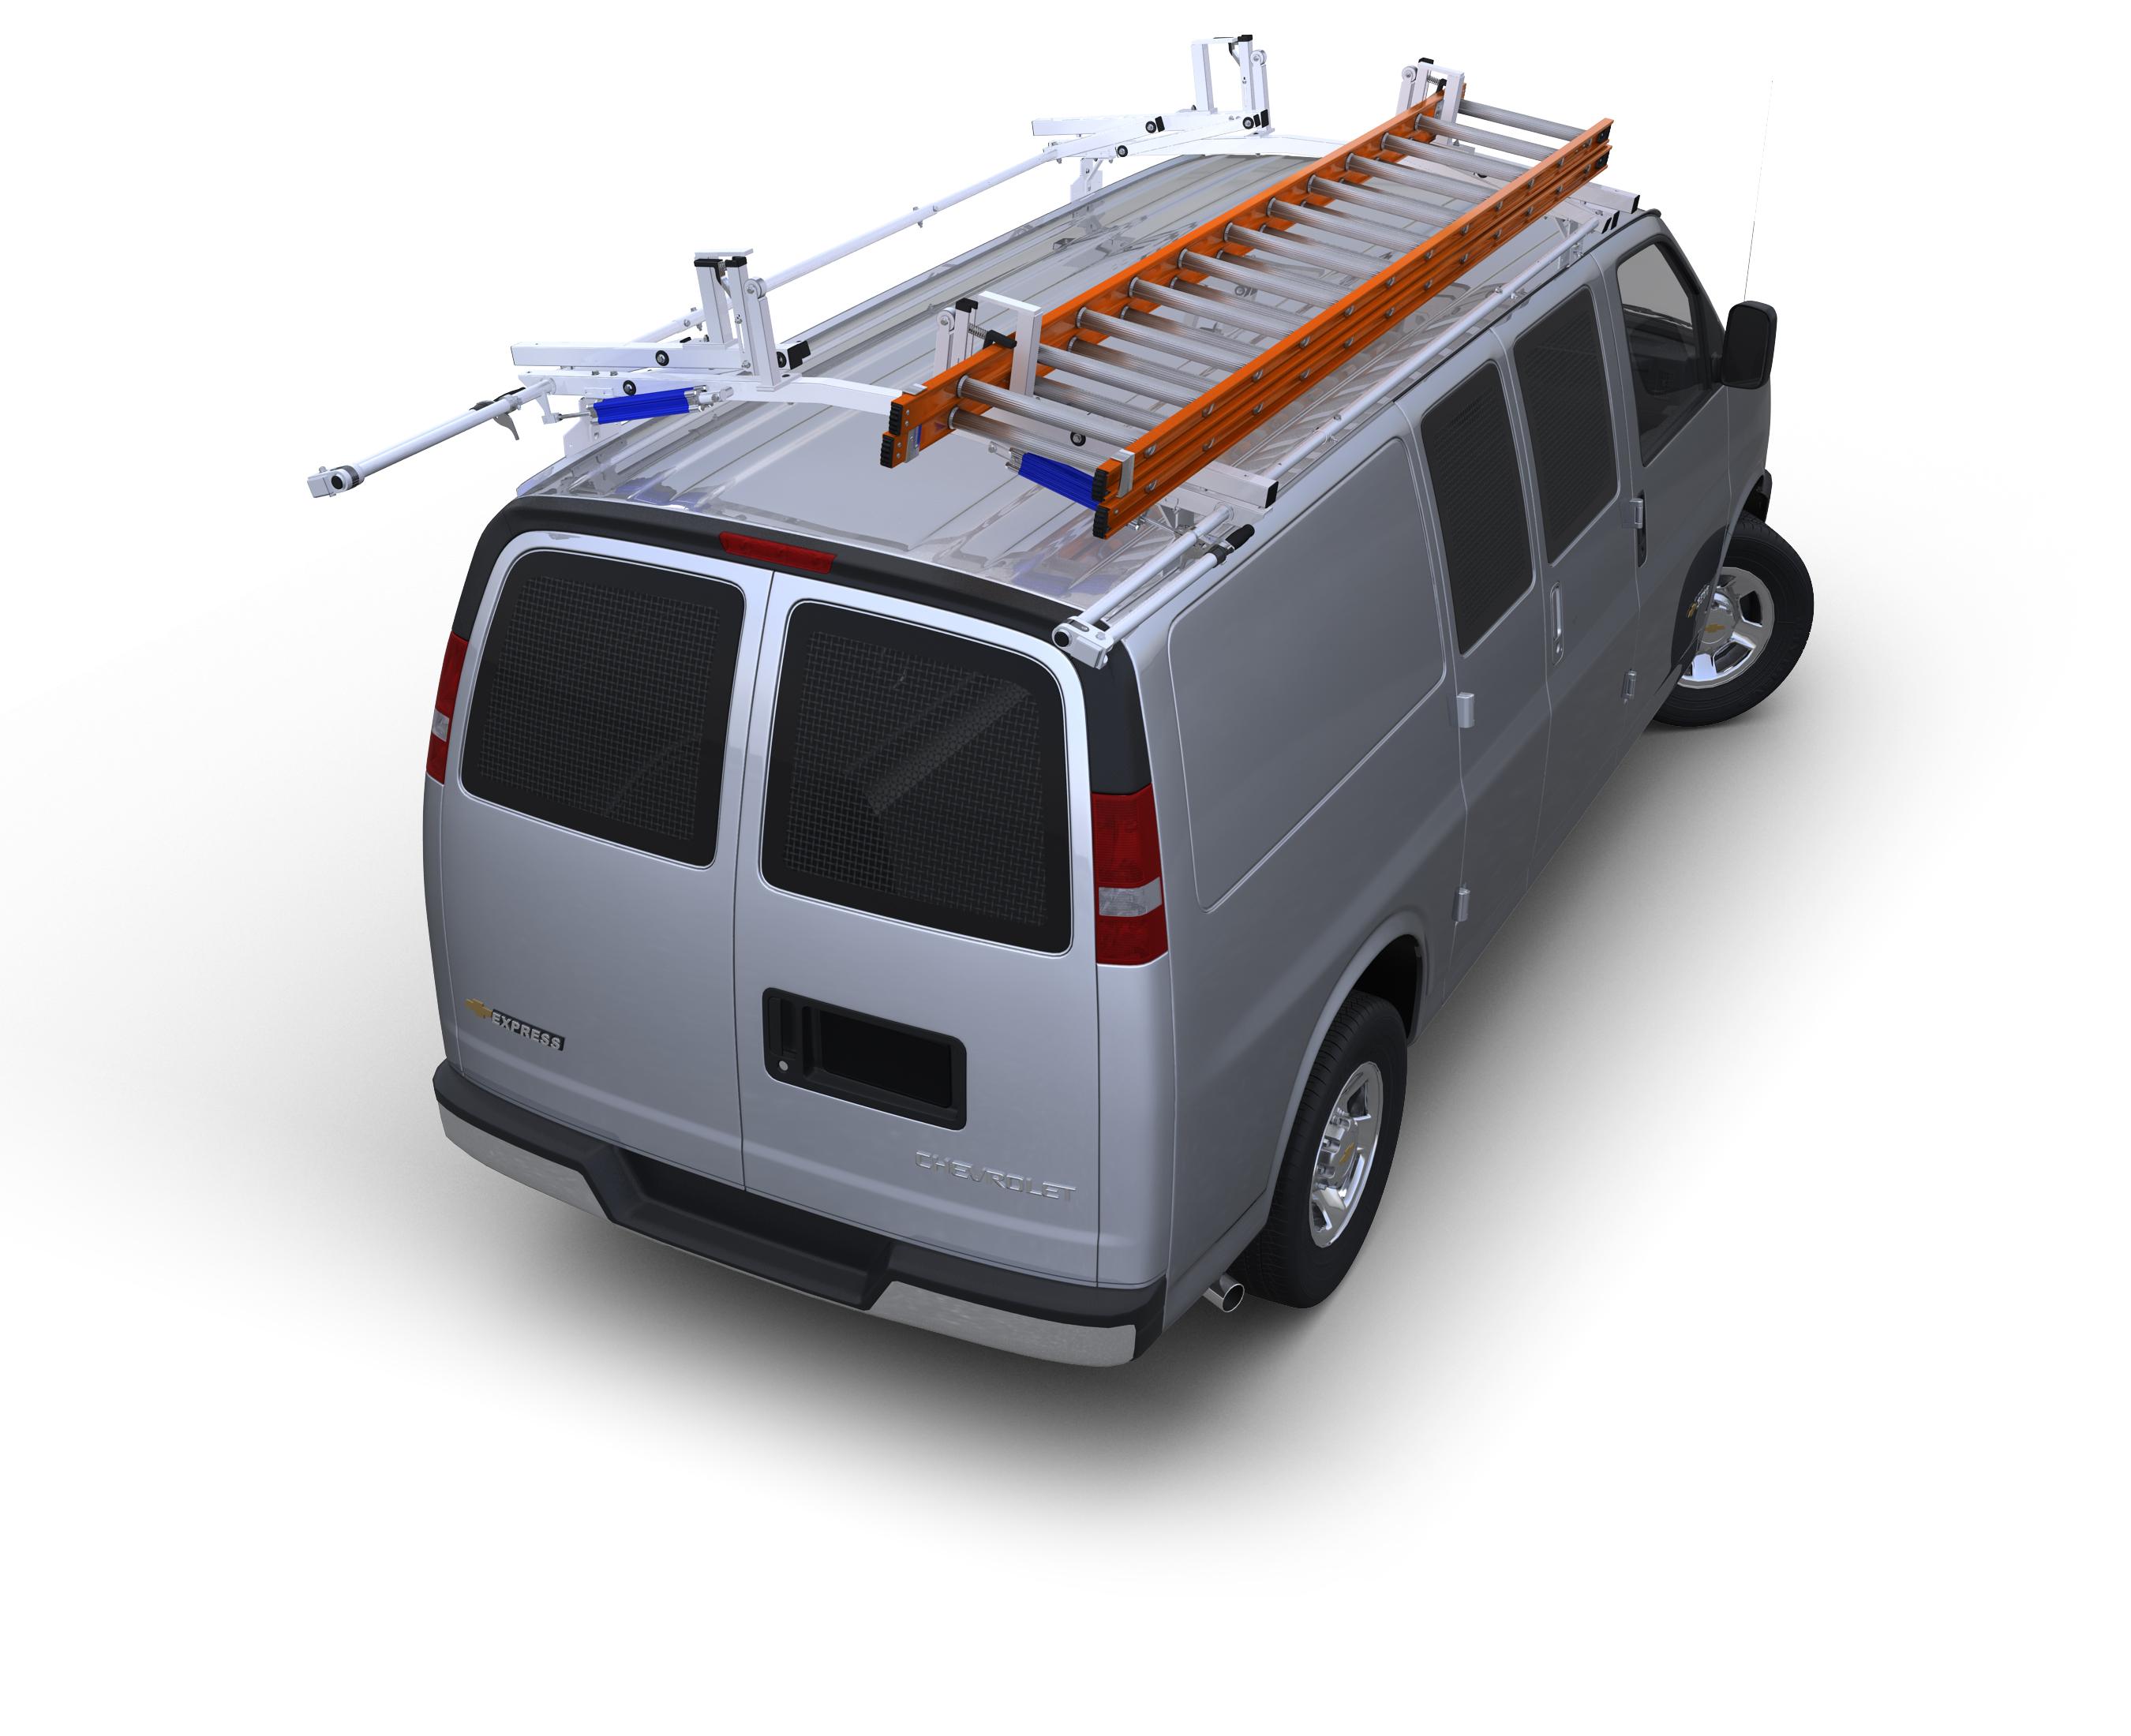 "Sprinter Hot Dip Galvanized Cargo Carrier Rack - 12' for 144"" Wheel Base Van"